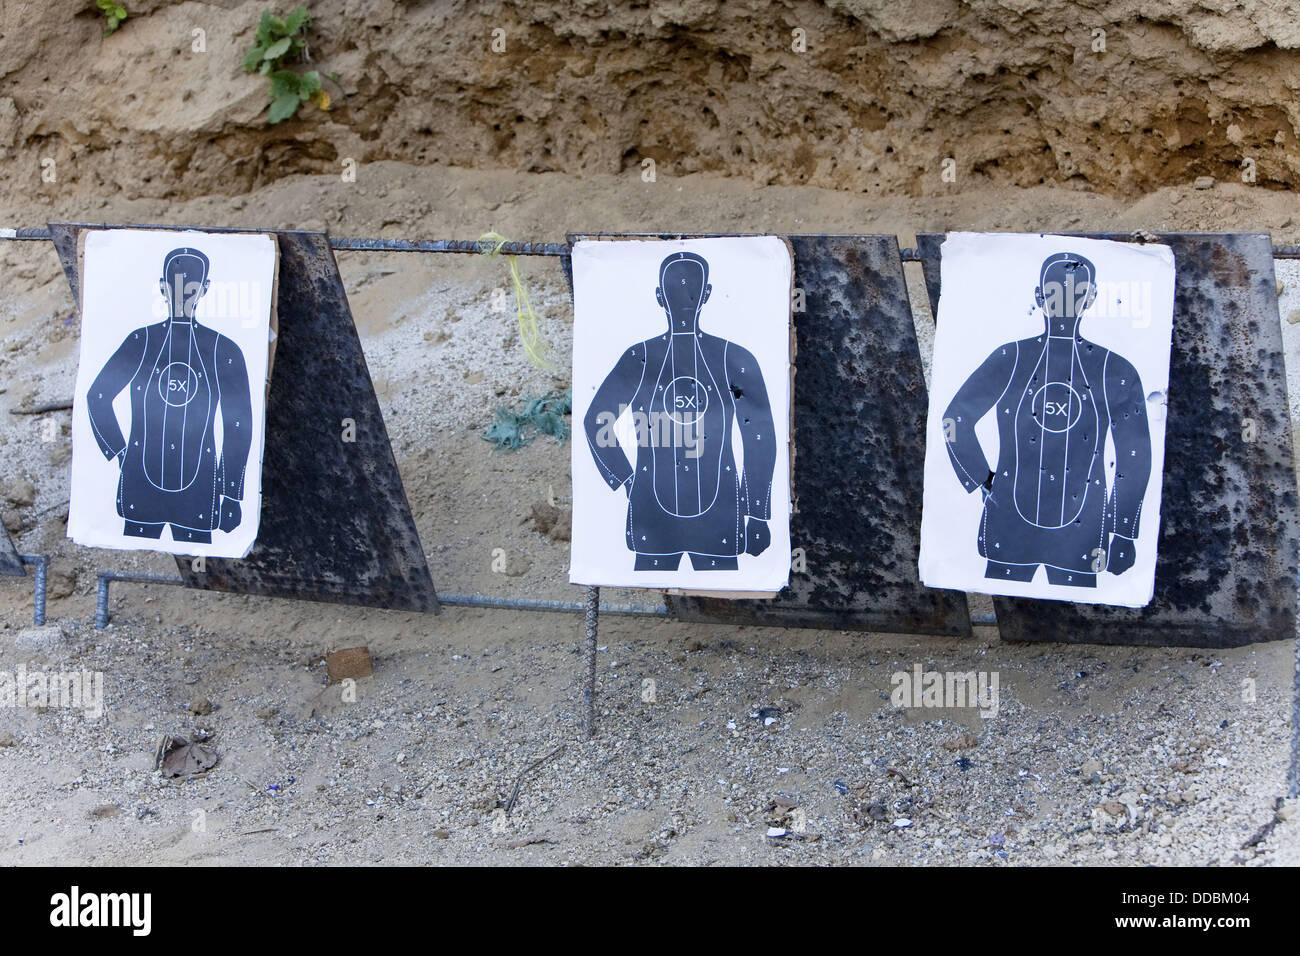 Target practice - Stock Image